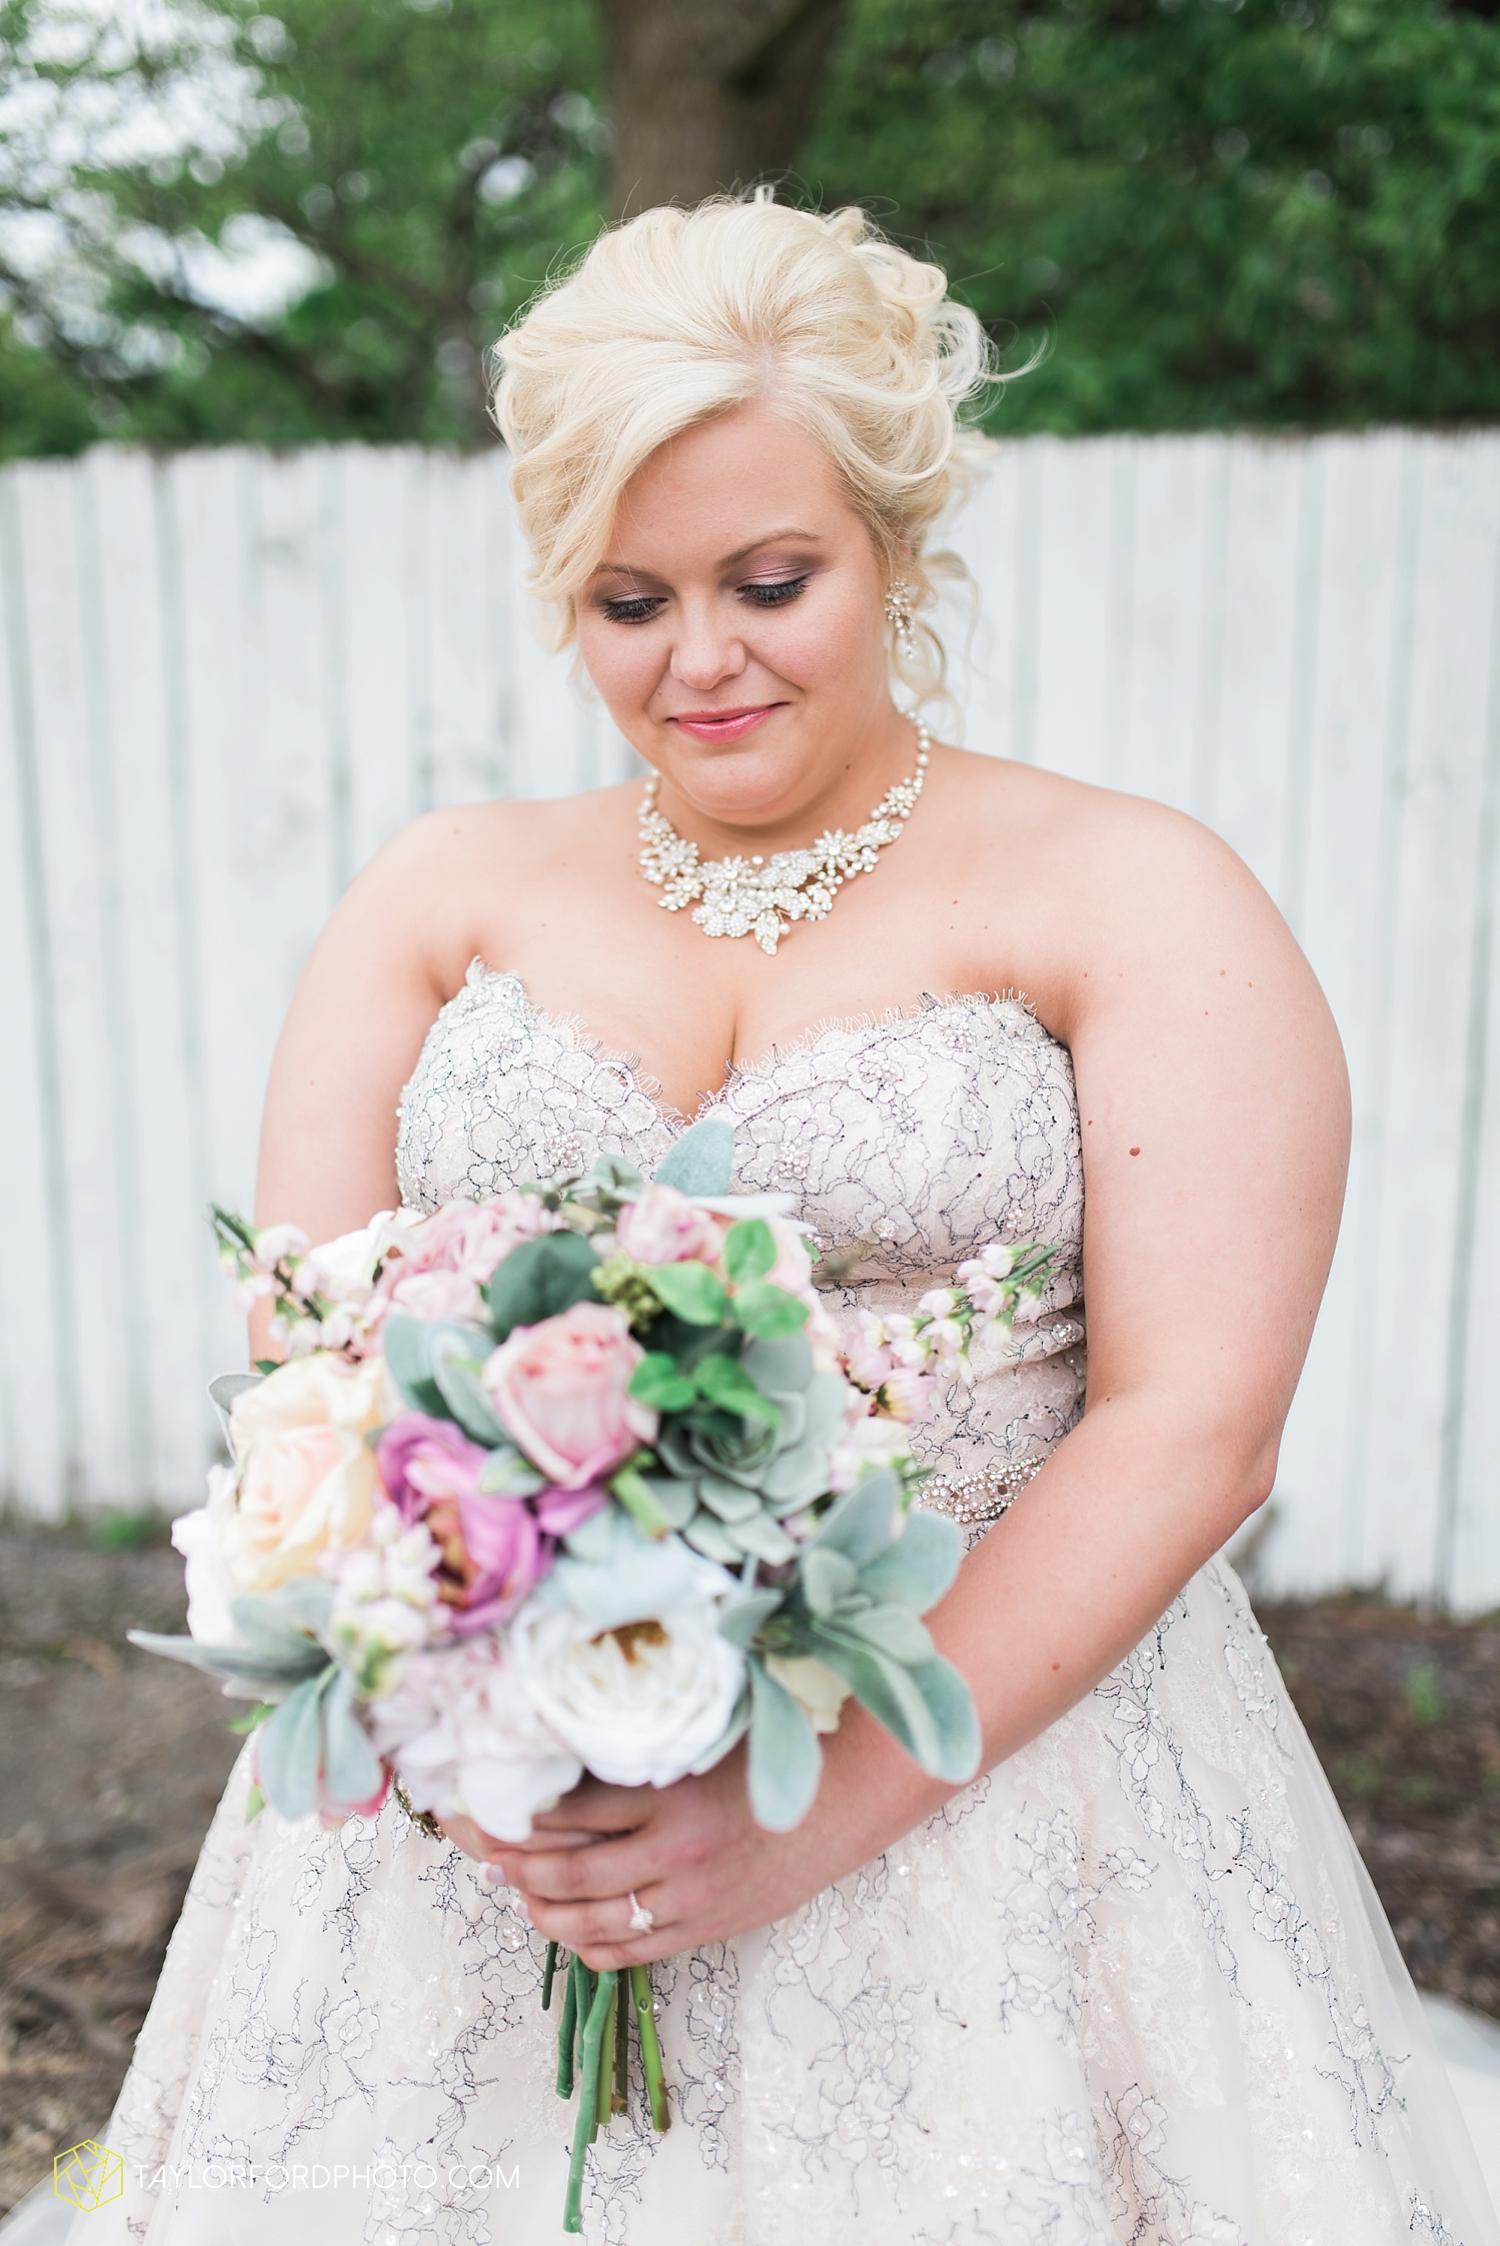 van_wert_ohio_wedding_photographer_taylor_ford_1225.jpg